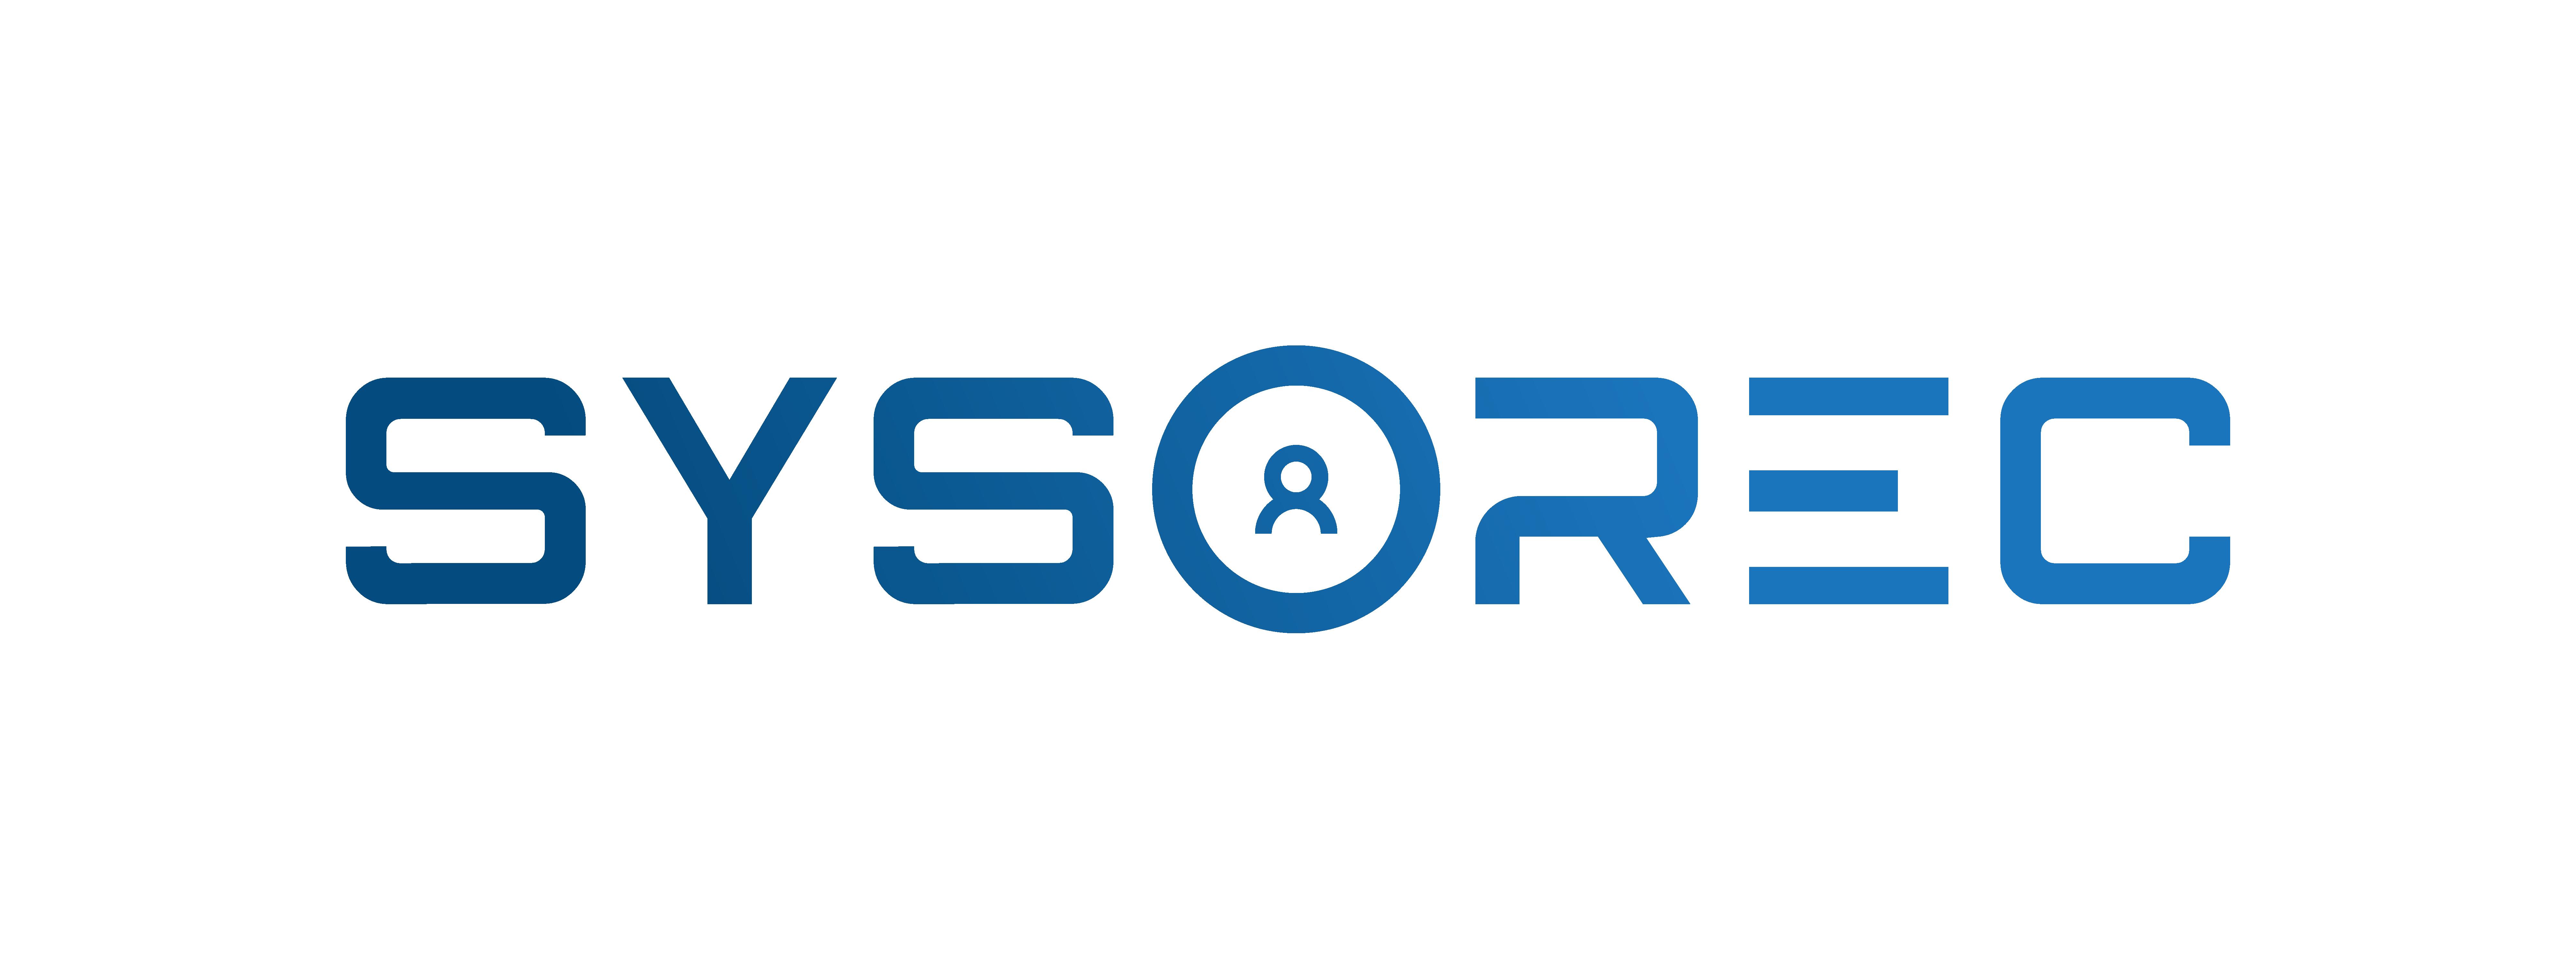 Additional Logos